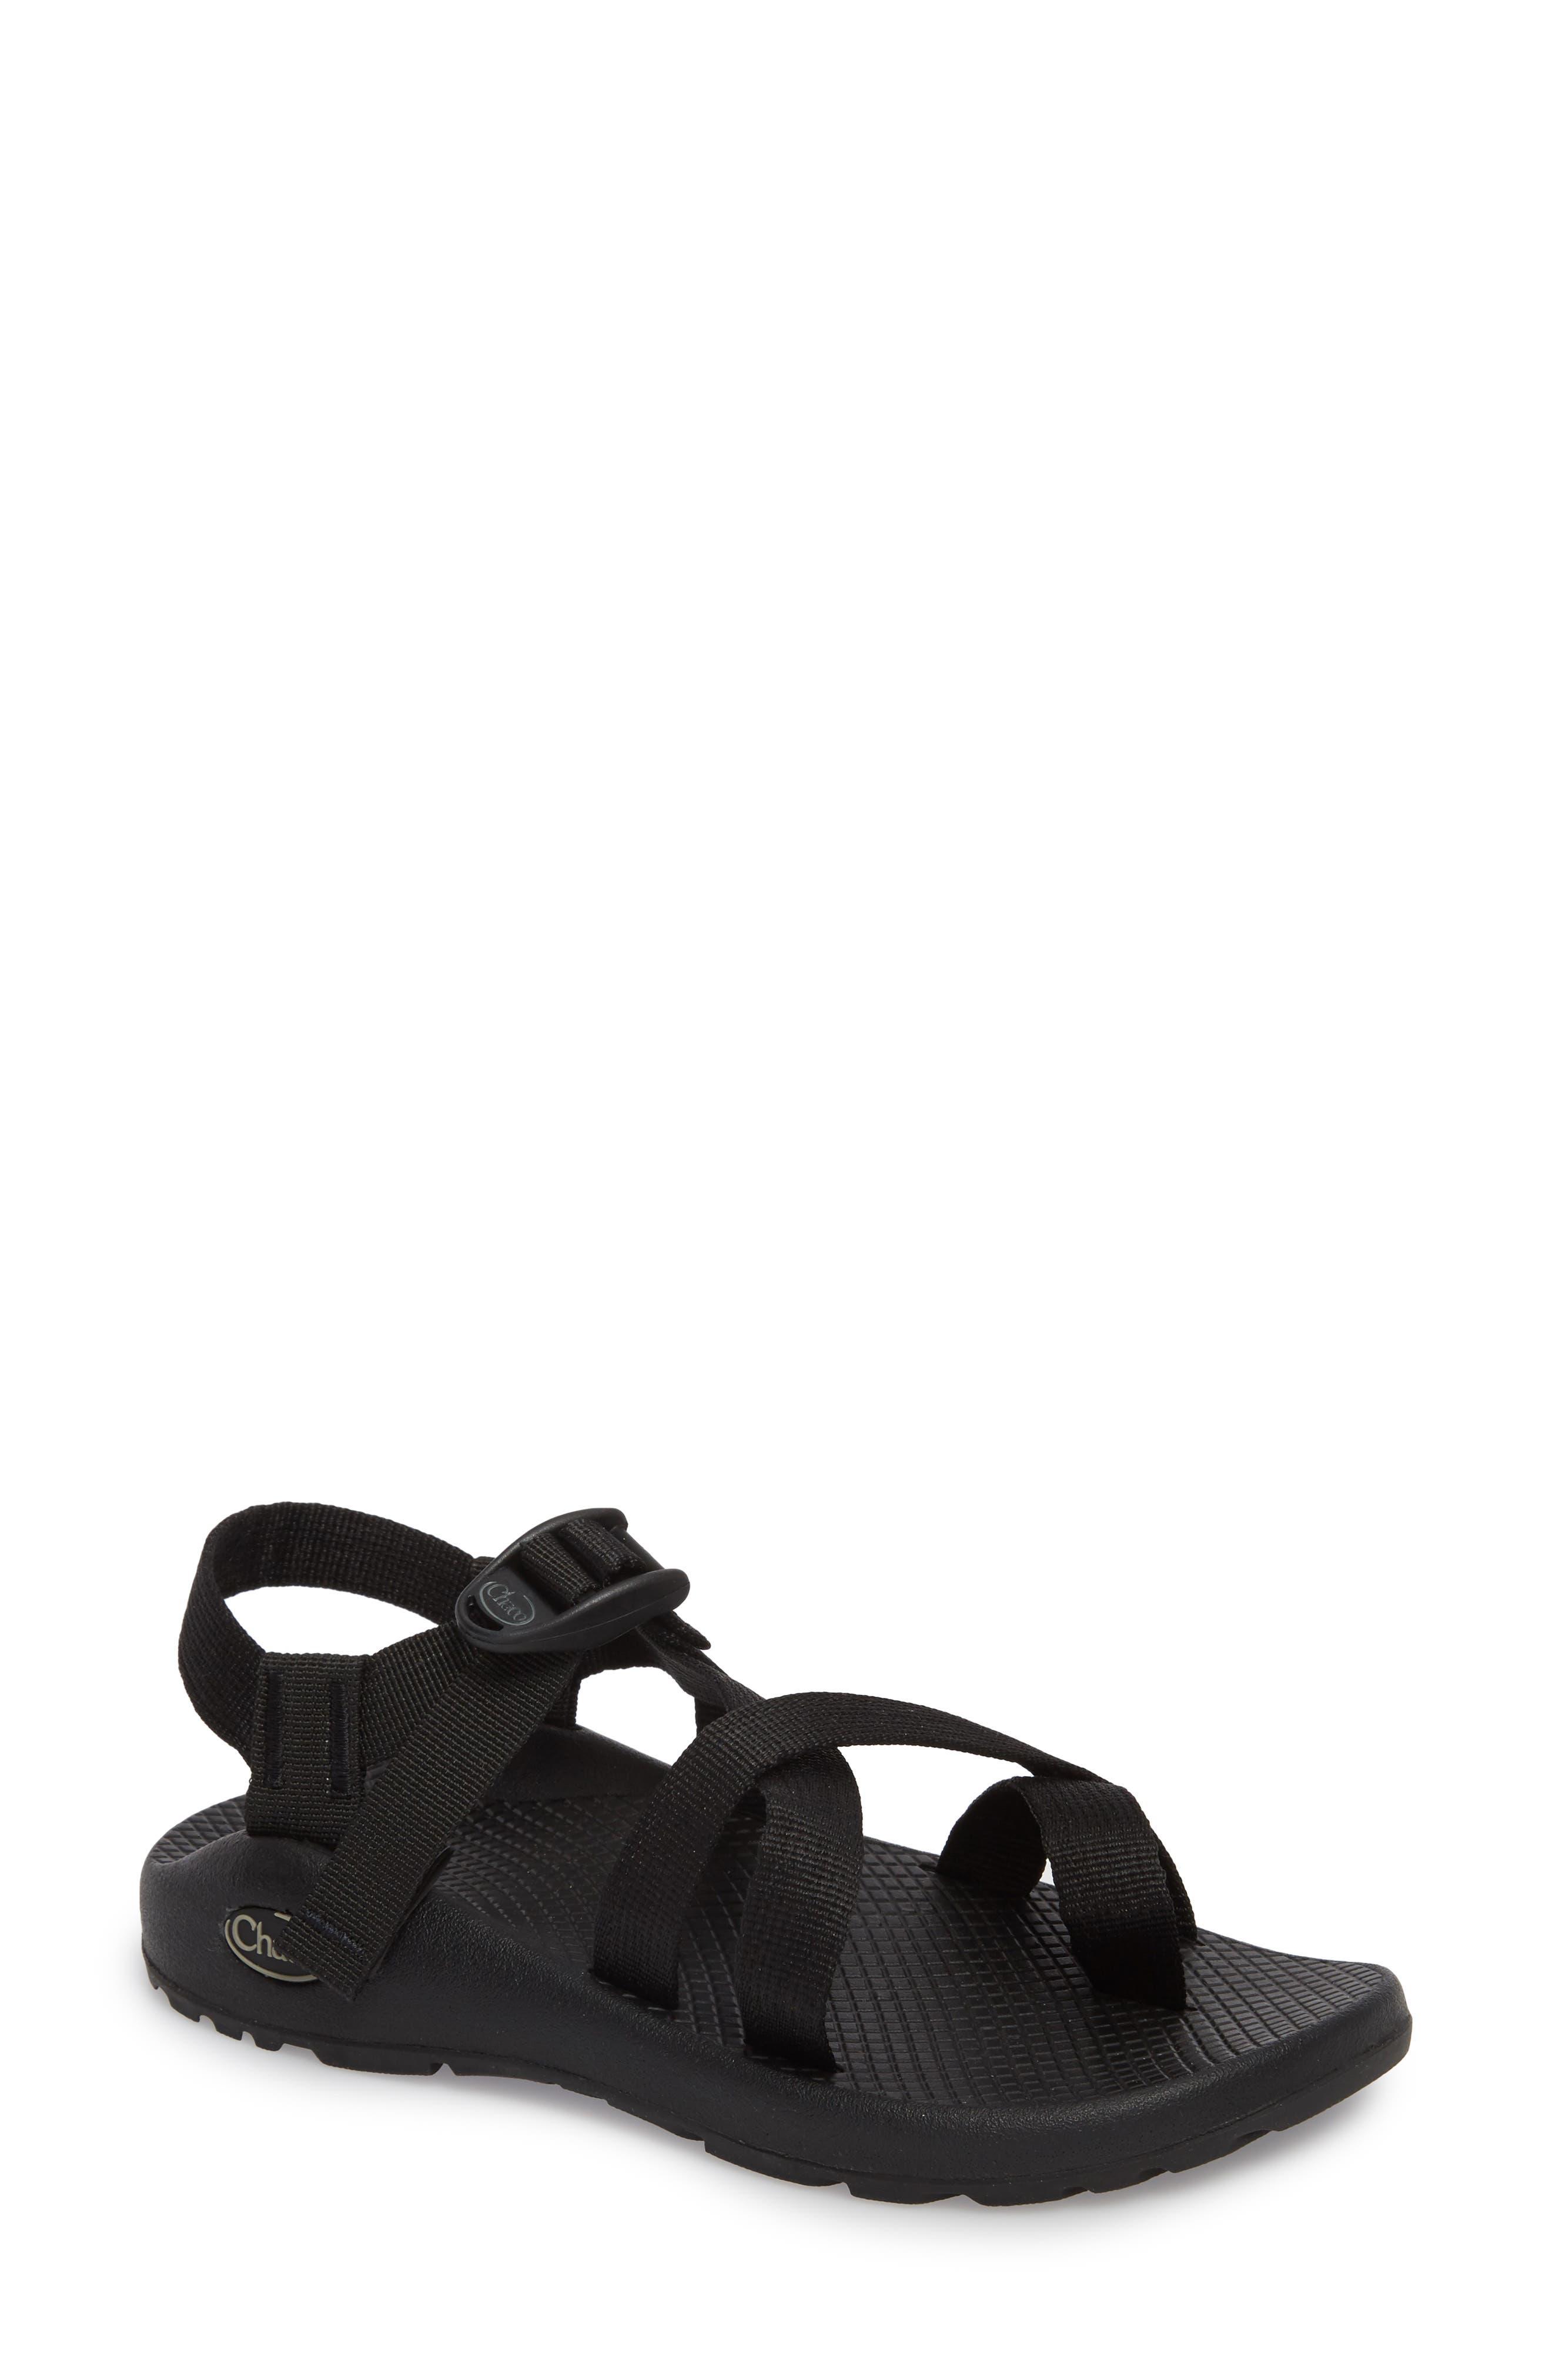 Z/2 Classic Sport Sandal,                         Main,                         color, Black